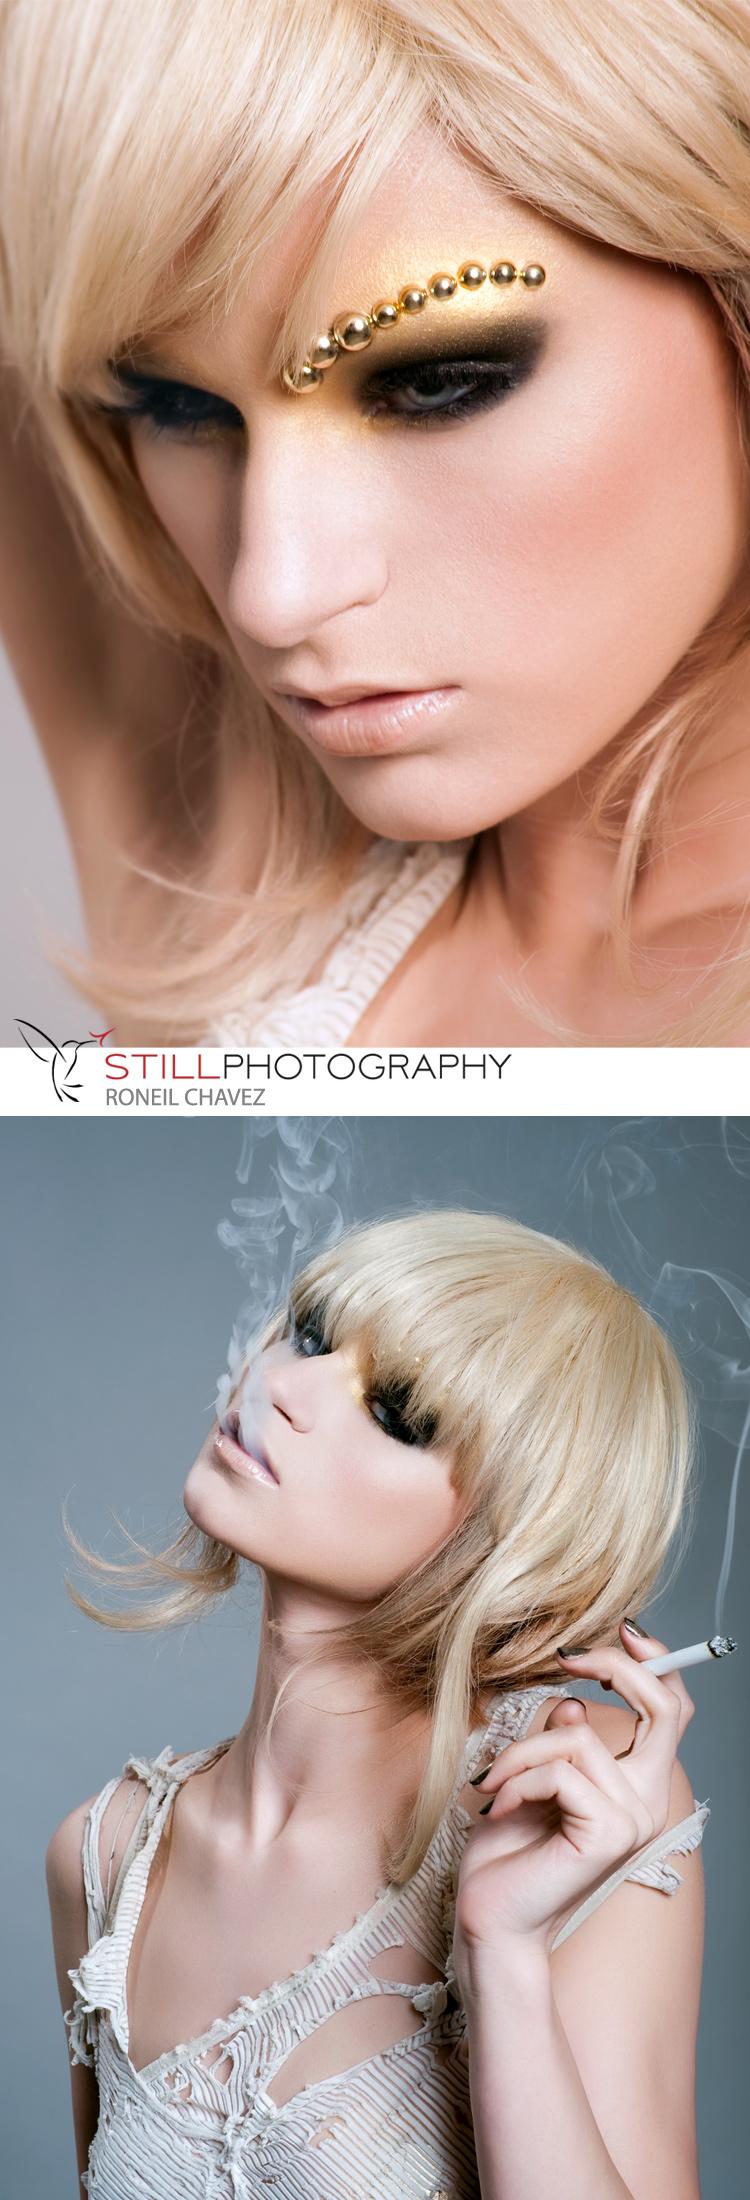 May 08, 2009 < 3            [p.s. i dont smoke cigs.]